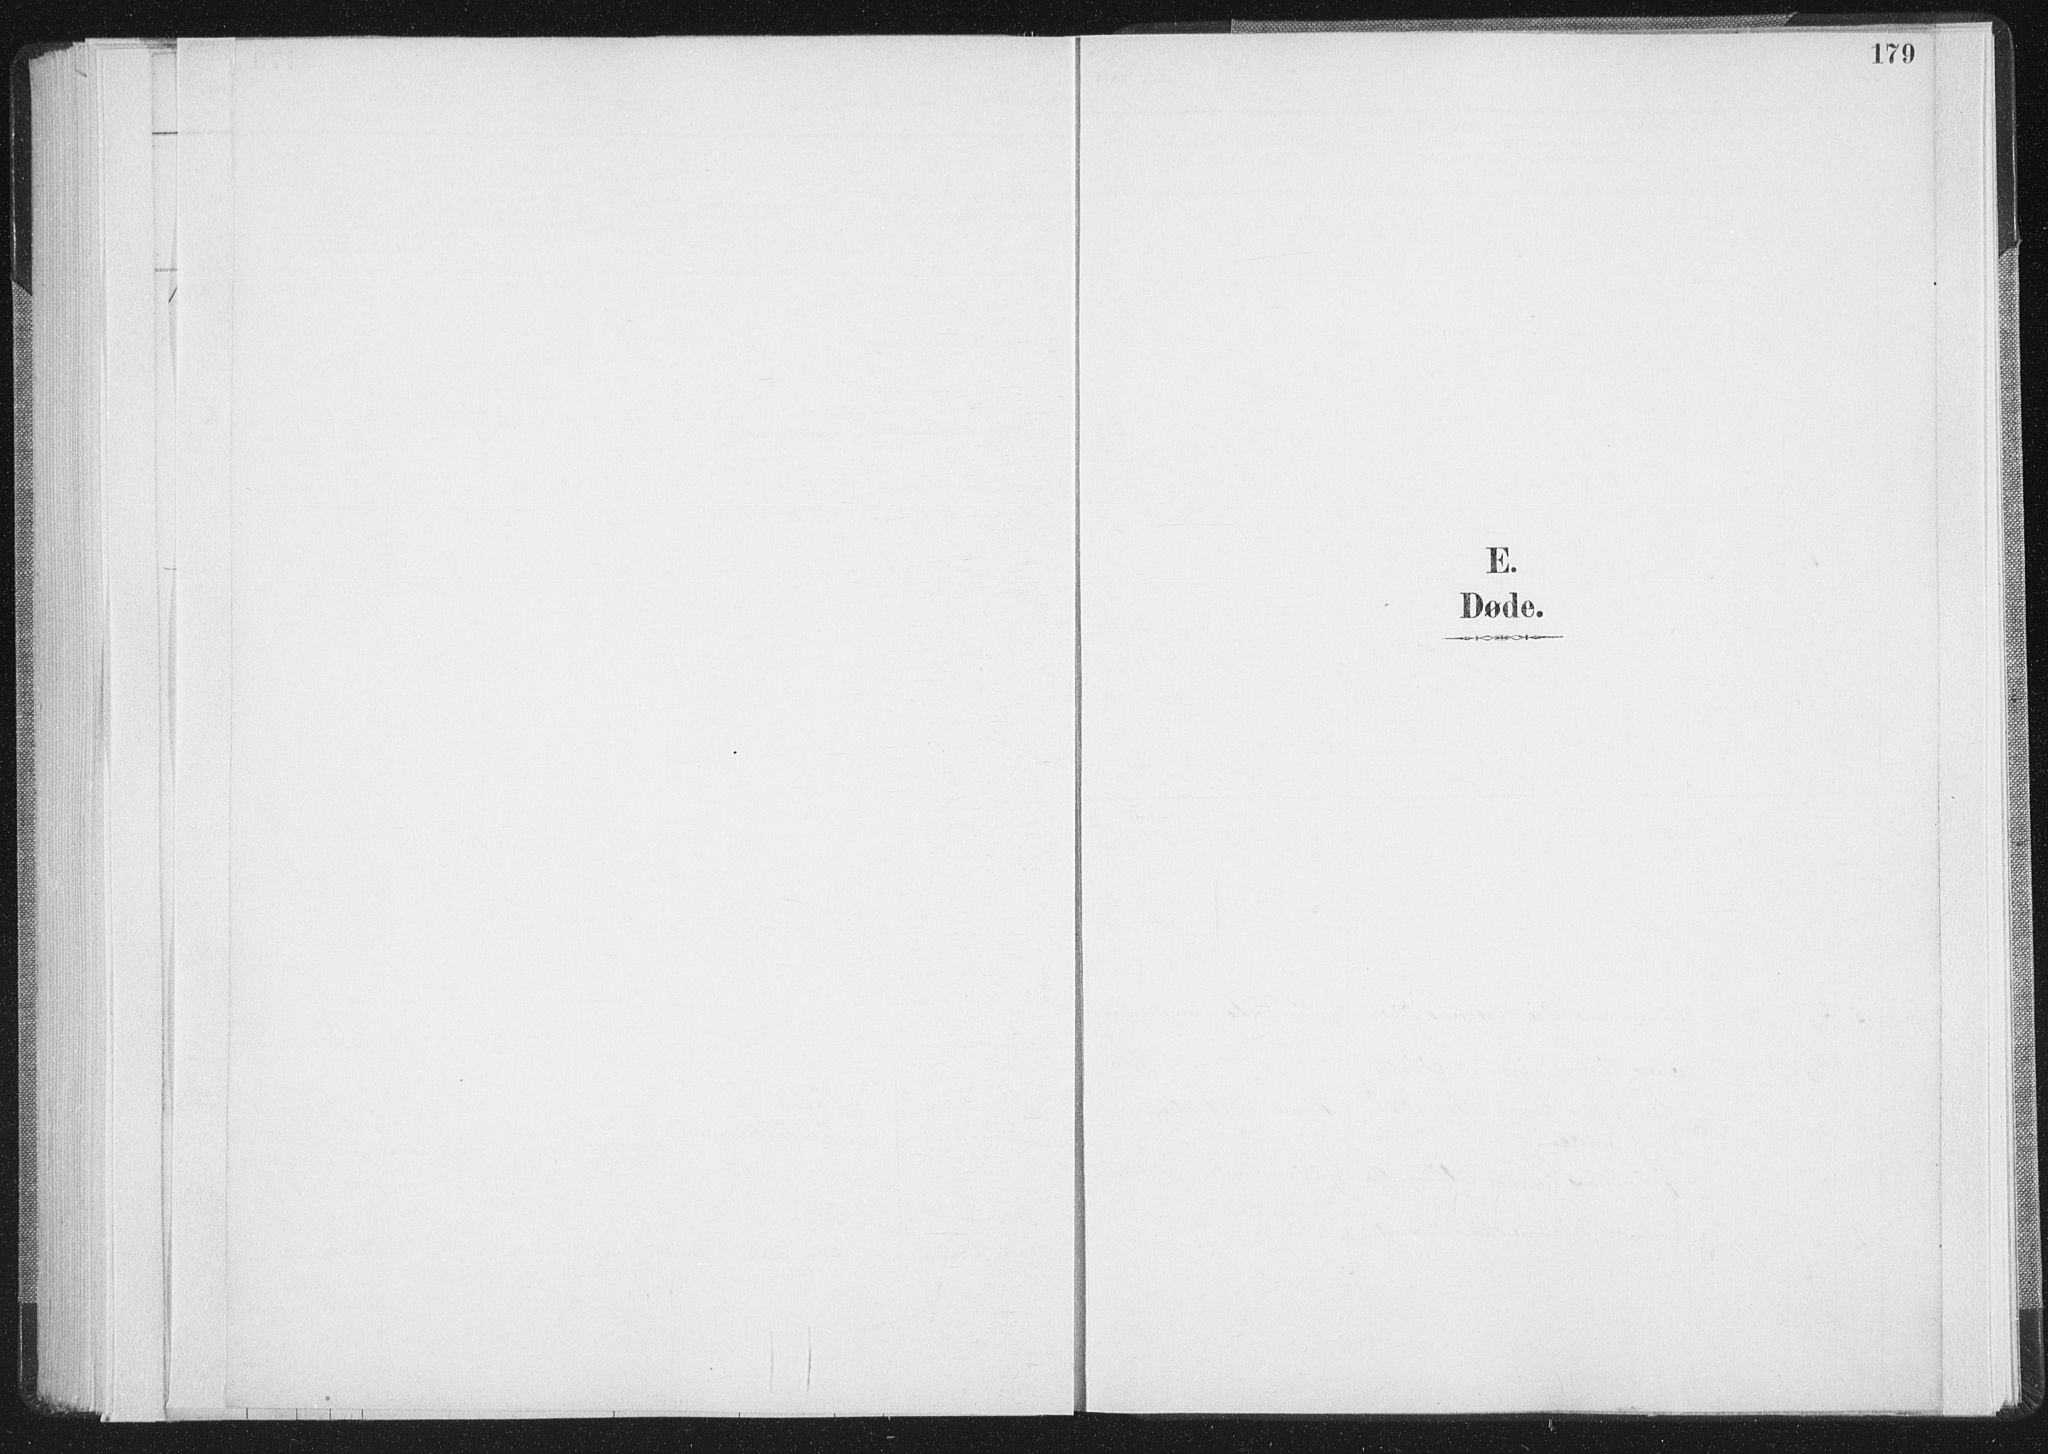 SAT, Ministerialprotokoller, klokkerbøker og fødselsregistre - Nordland, 898/L1422: Ministerialbok nr. 898A02, 1887-1908, s. 179